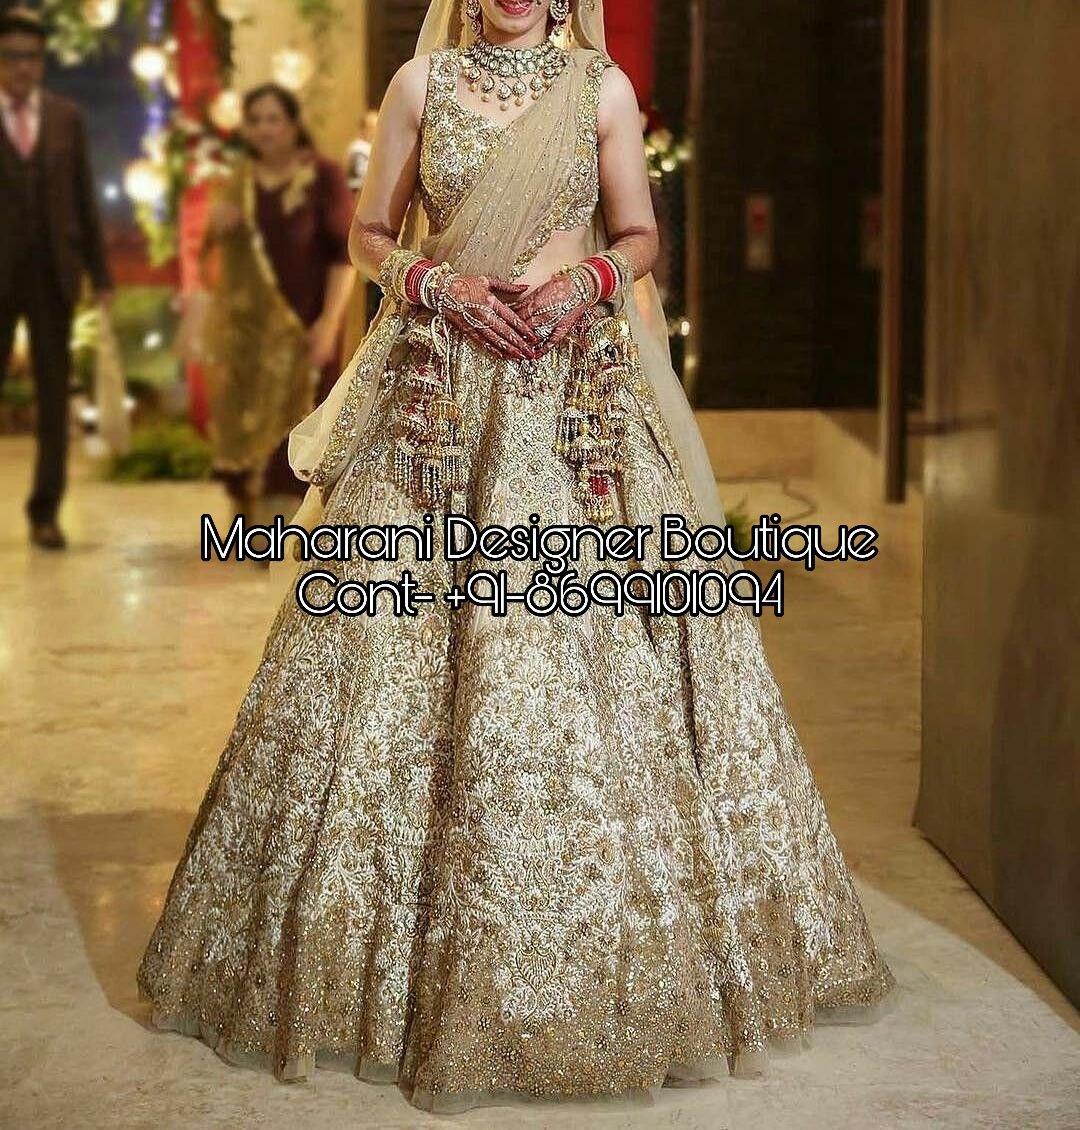 f8177dde46 Find Here designer lehenga boutique online, bridal lehenga online boutique,  bridal lehenga online boutique